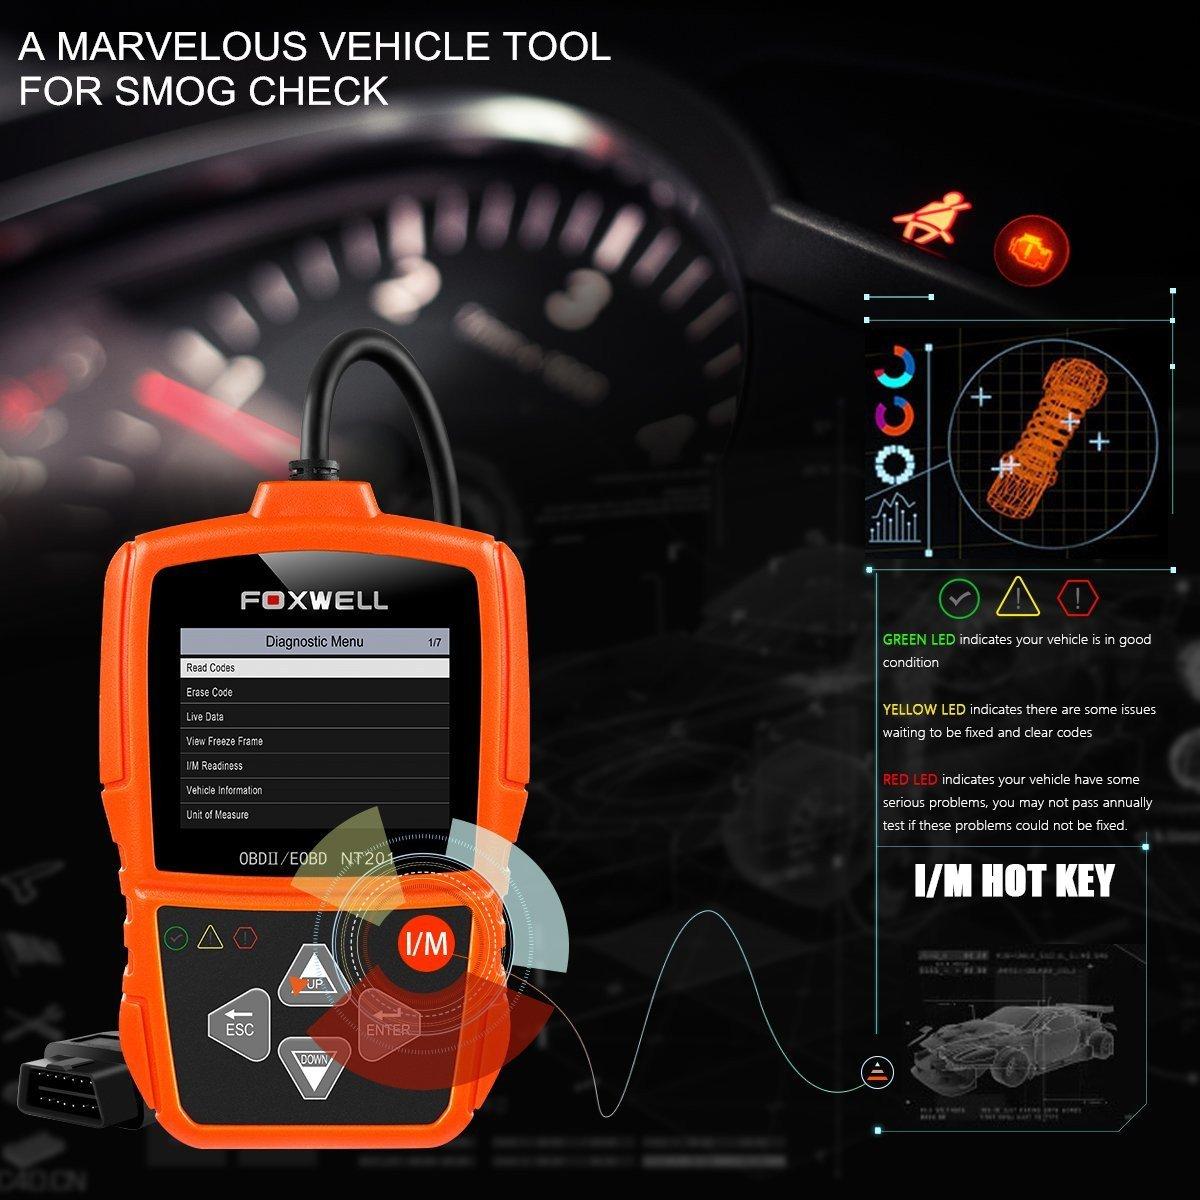 Amazon.com: FOXWEL NT201 Auto OBD2 Scanner Check Car Engine Light Fault Code  Reader OBD II Diagnostic Scan Tool: Automotive